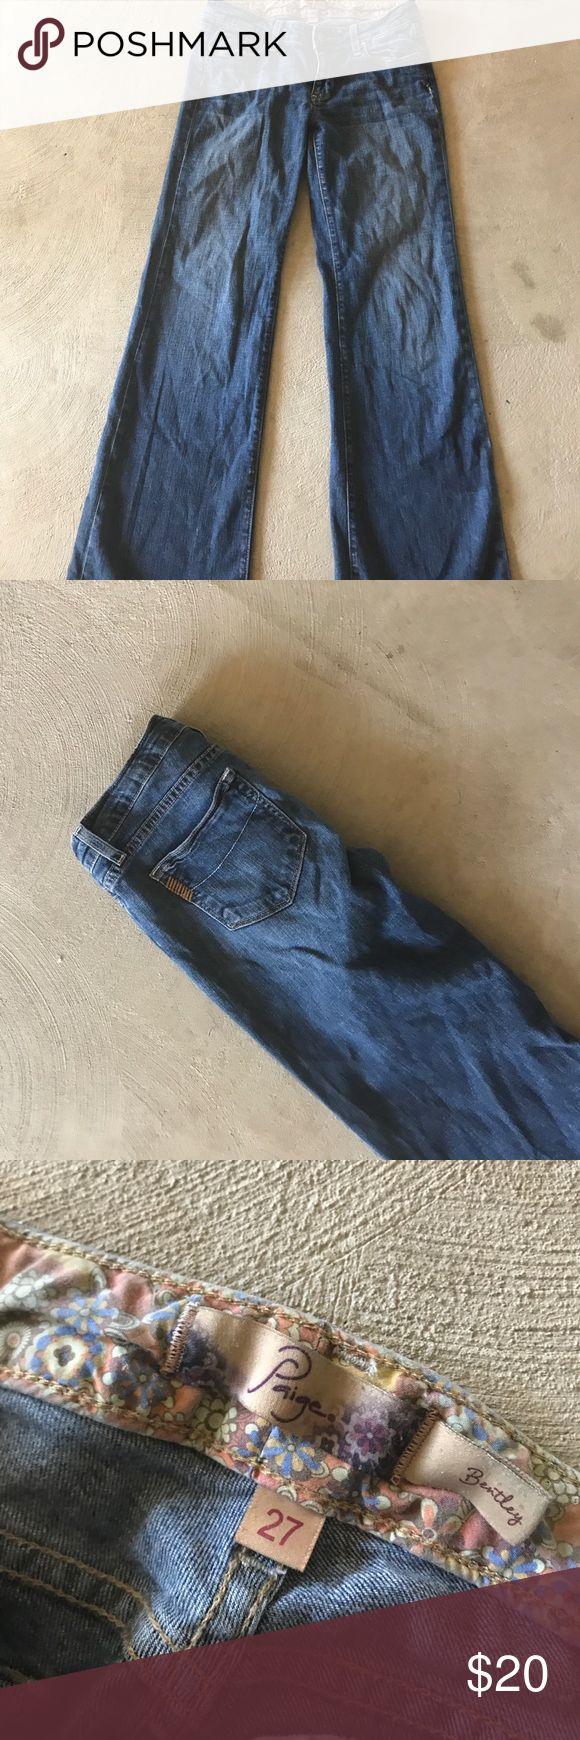 Paige Jeans Paige Jeans Paige Jeans Jeans Boot Cut